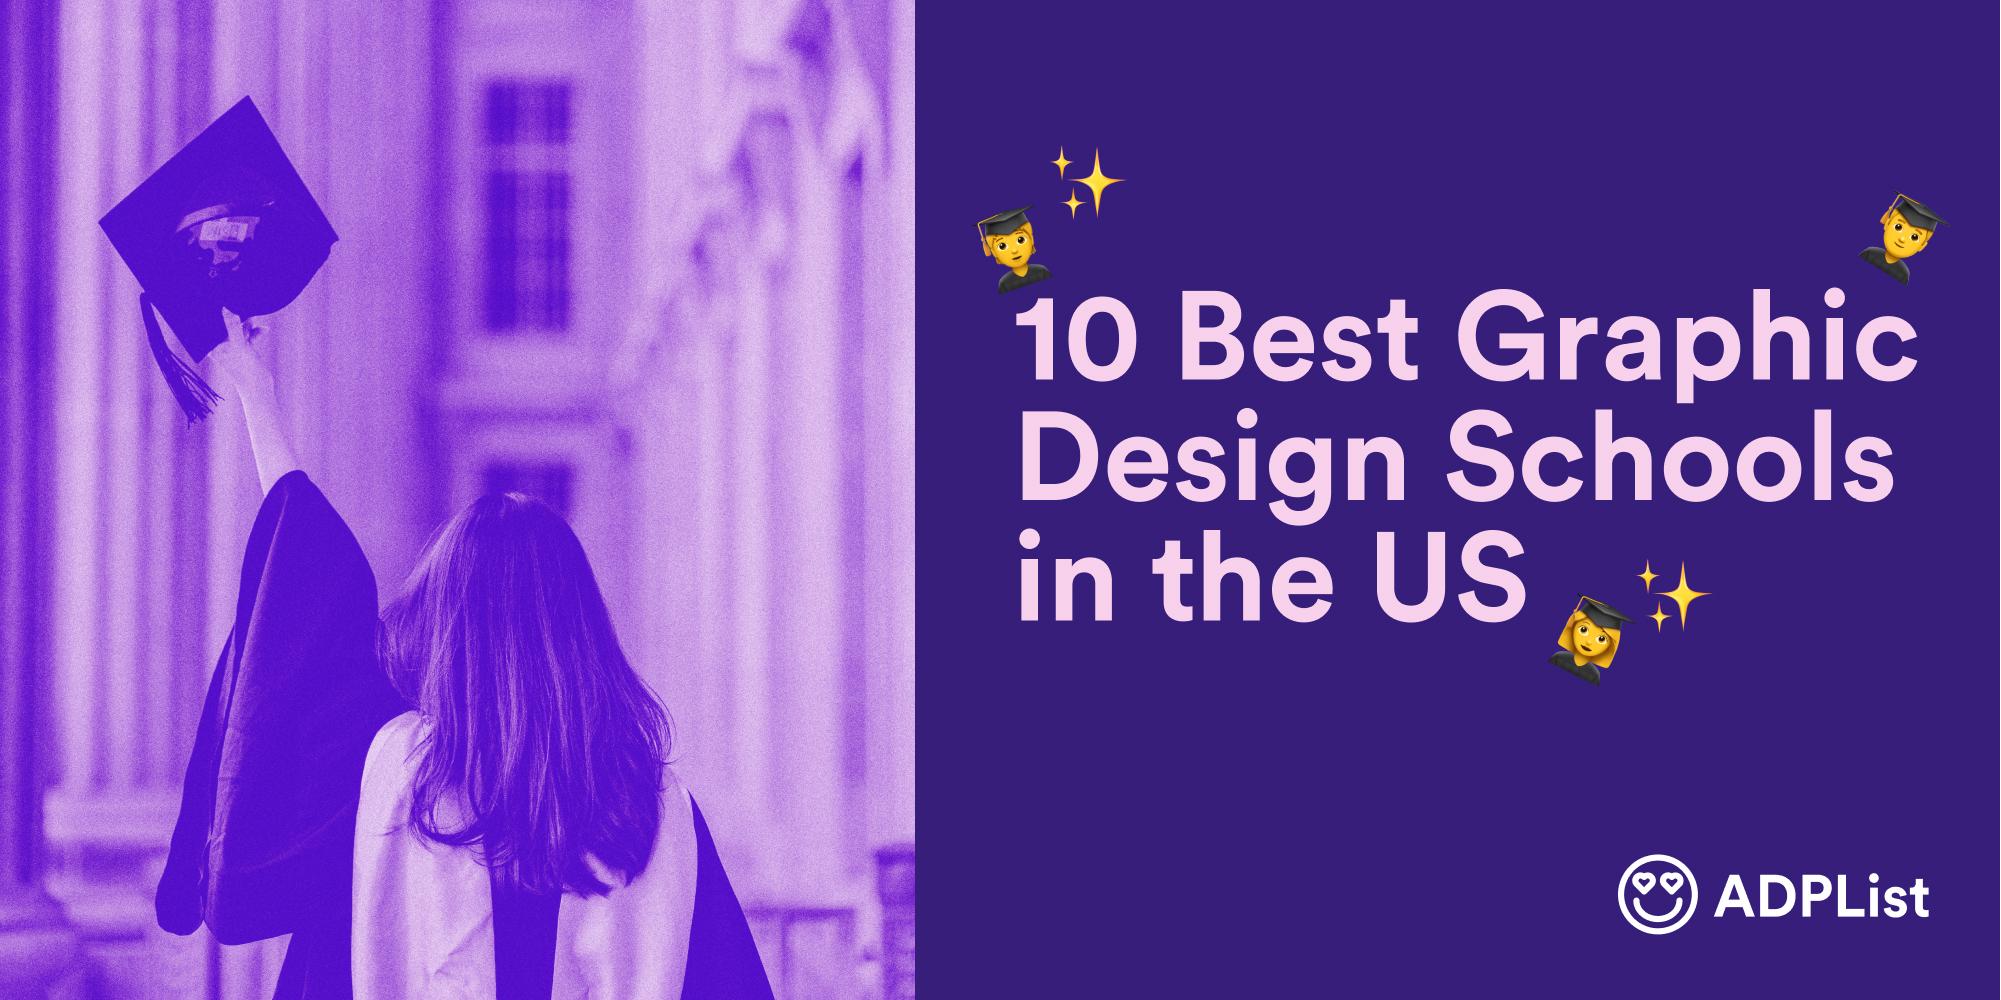 10 Best Graphic Design Schools in the US